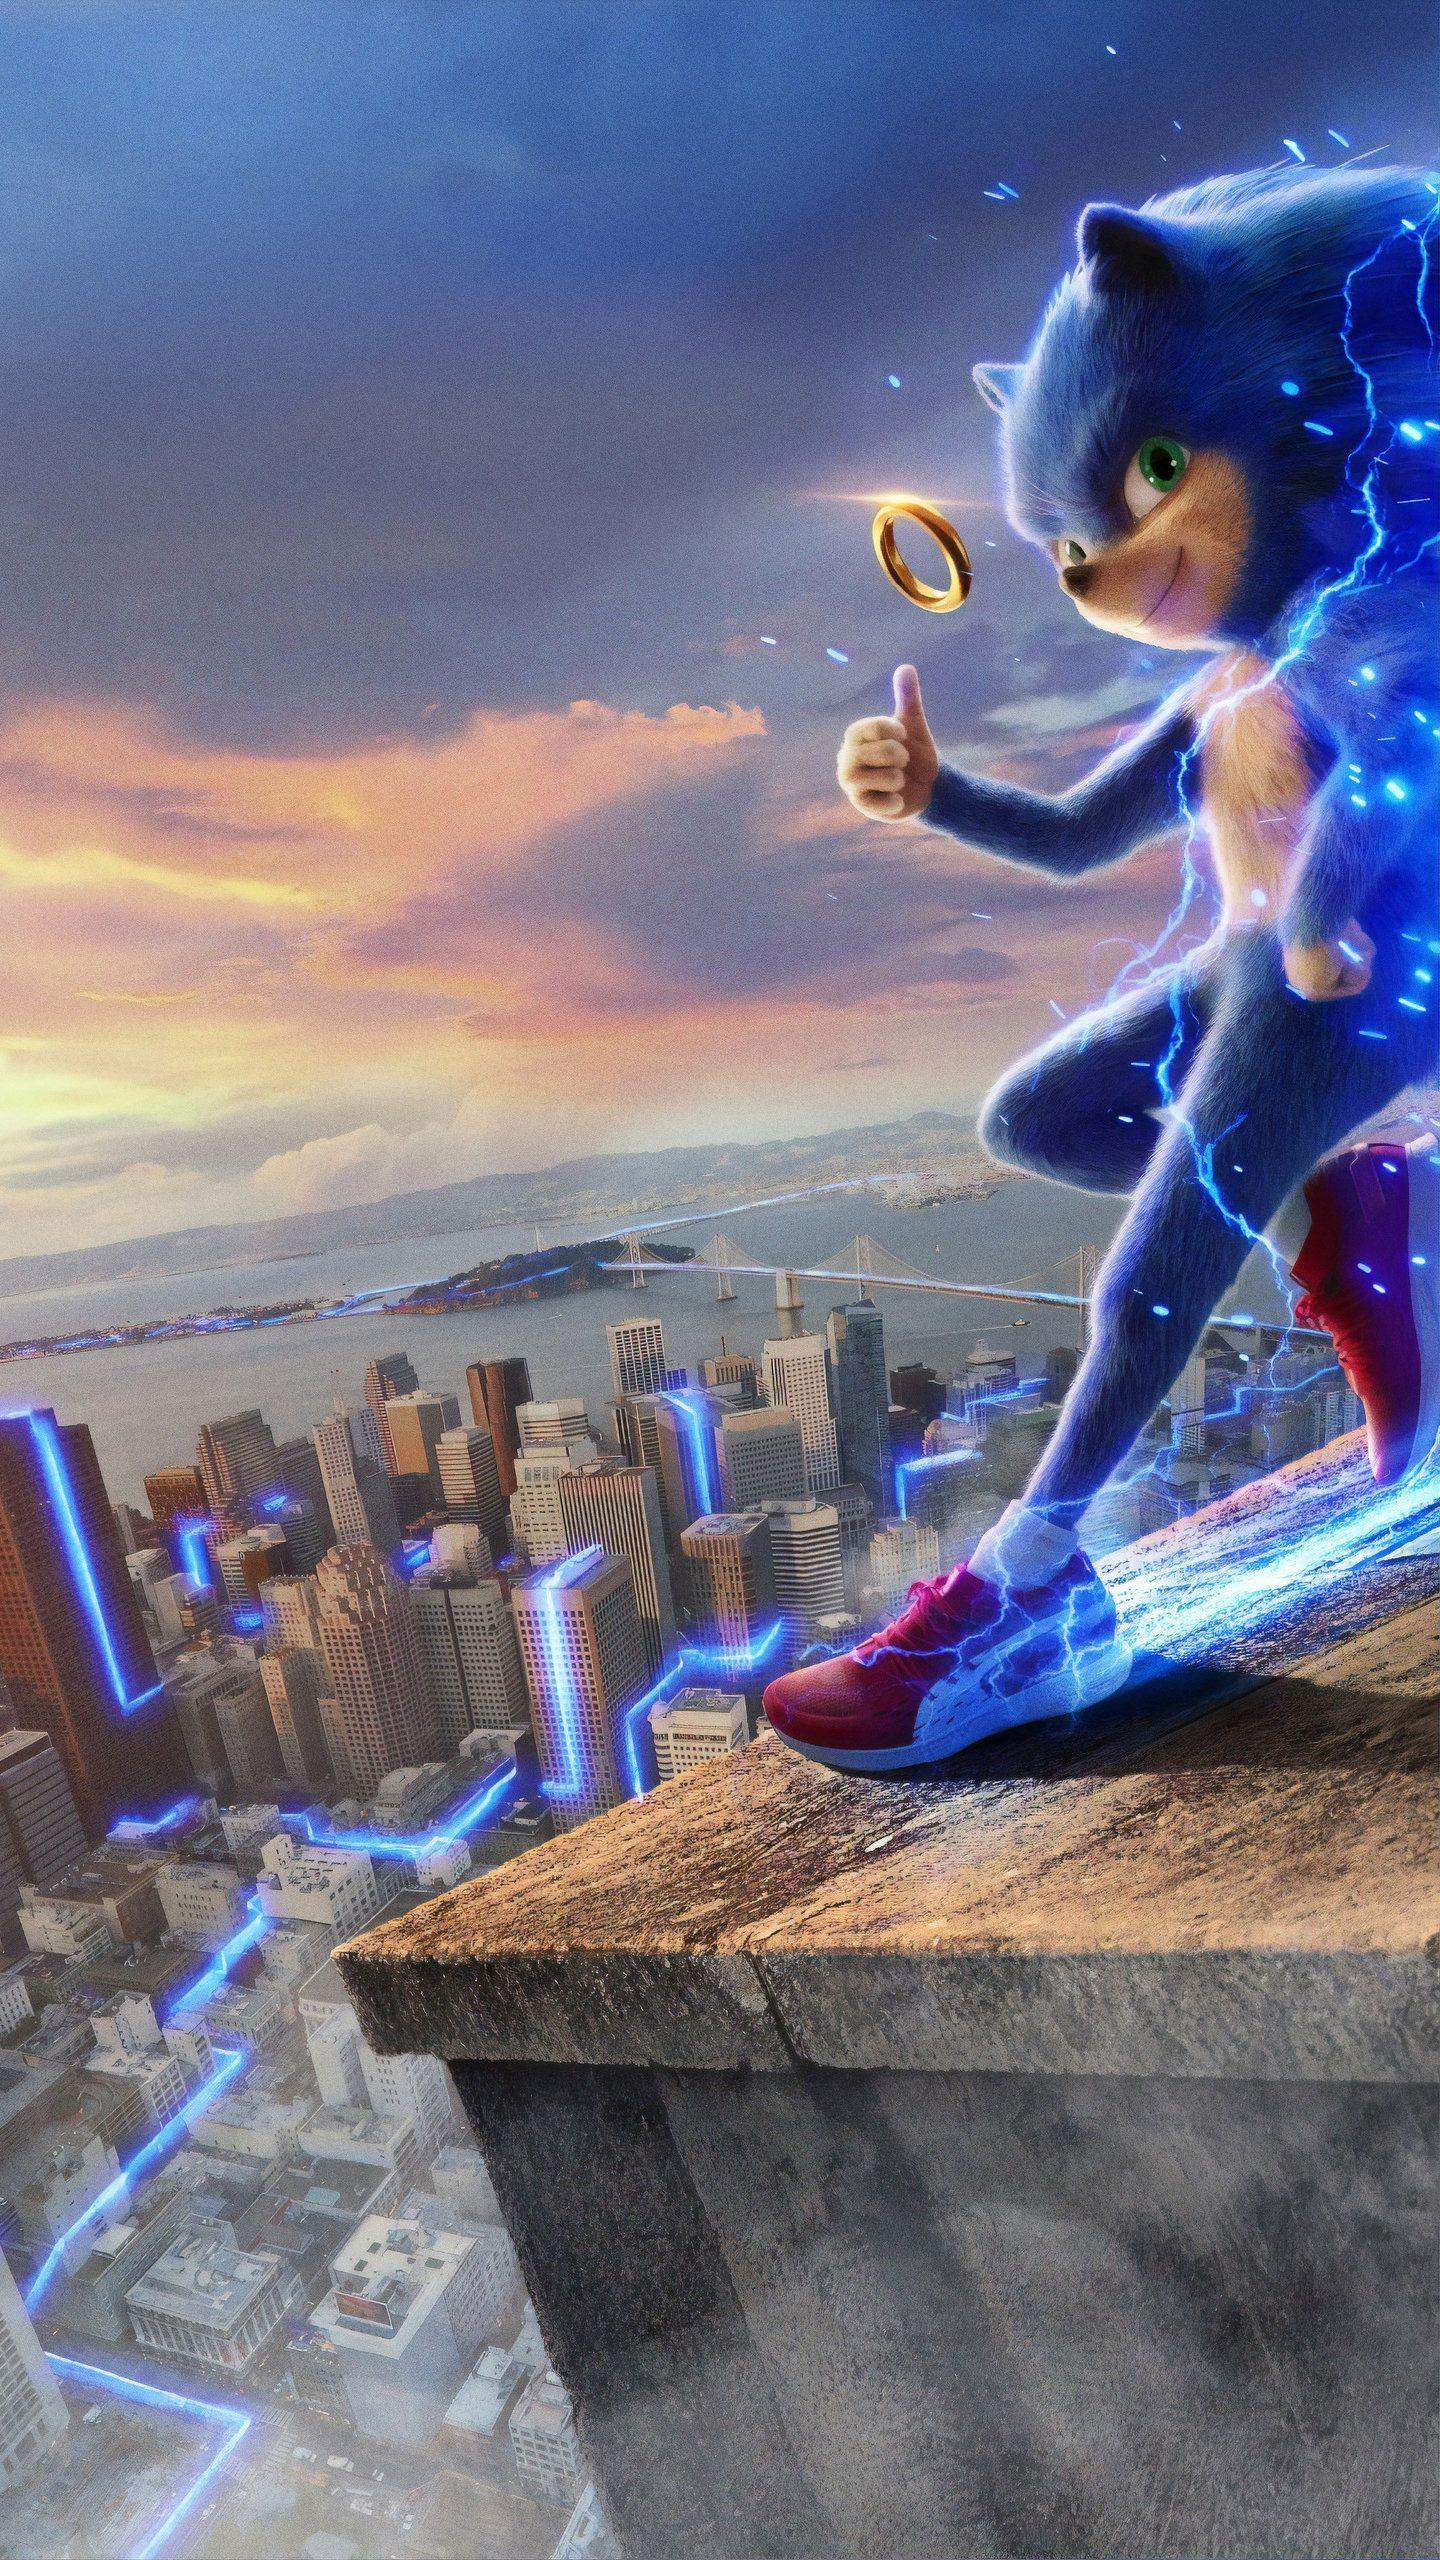 Sonic The Hedgehog 2019 Movie 4k Hd Movies Wallpapers Photos And Pictures Hedgehog Movie Movie Wallpapers Sonic And Shadow